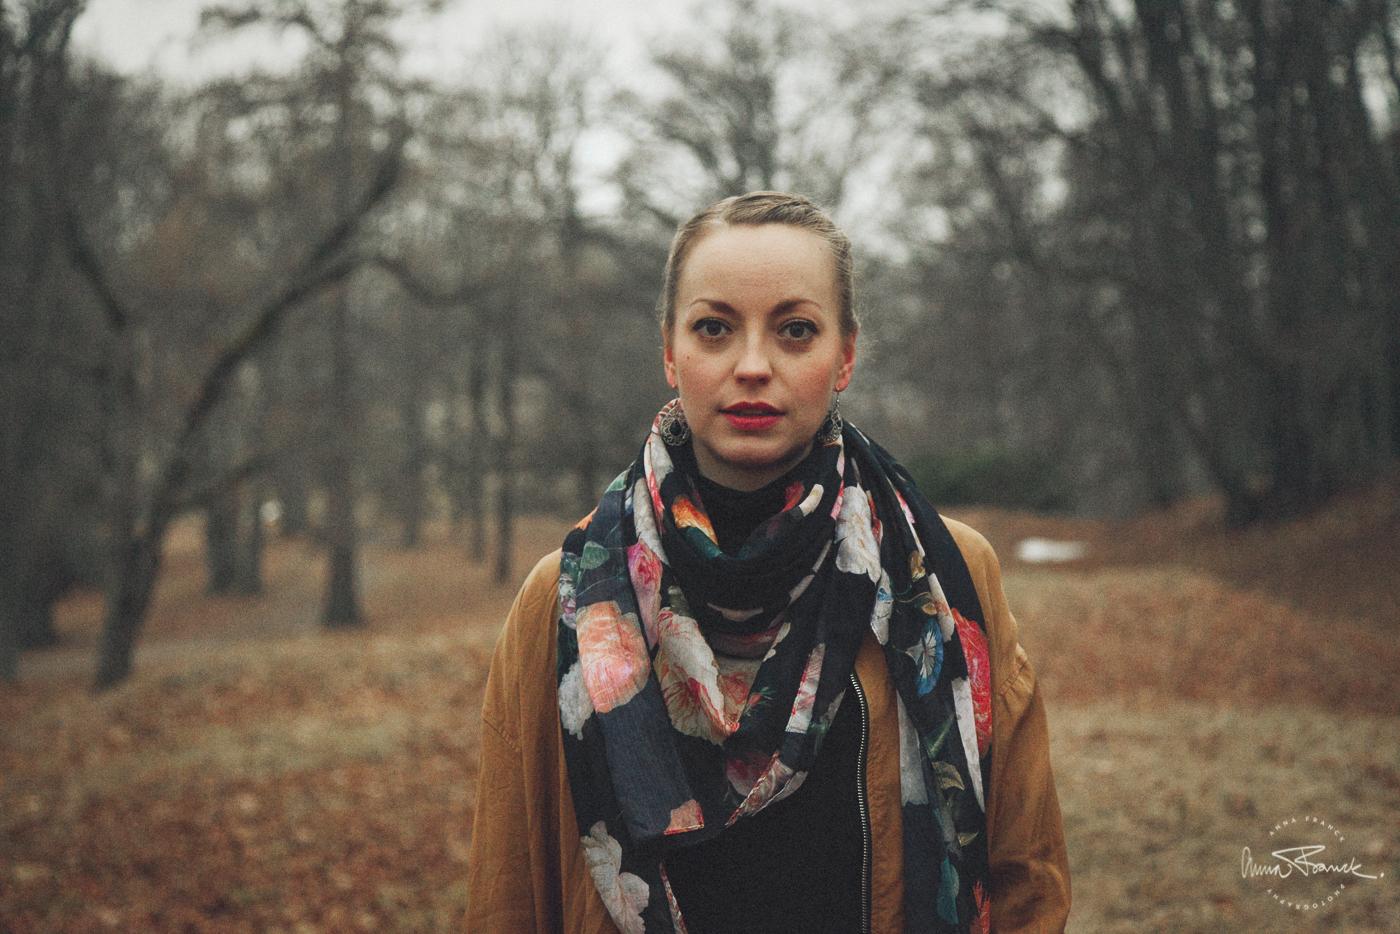 anna, franck, photography, portraits, sstockholm, tyresö, porträtt, muotokuva, fotograf, valokuvaaja, photographer, portraitphotographer, natural, relaxed, nature, winter, soft, light, ice, location, storytelling